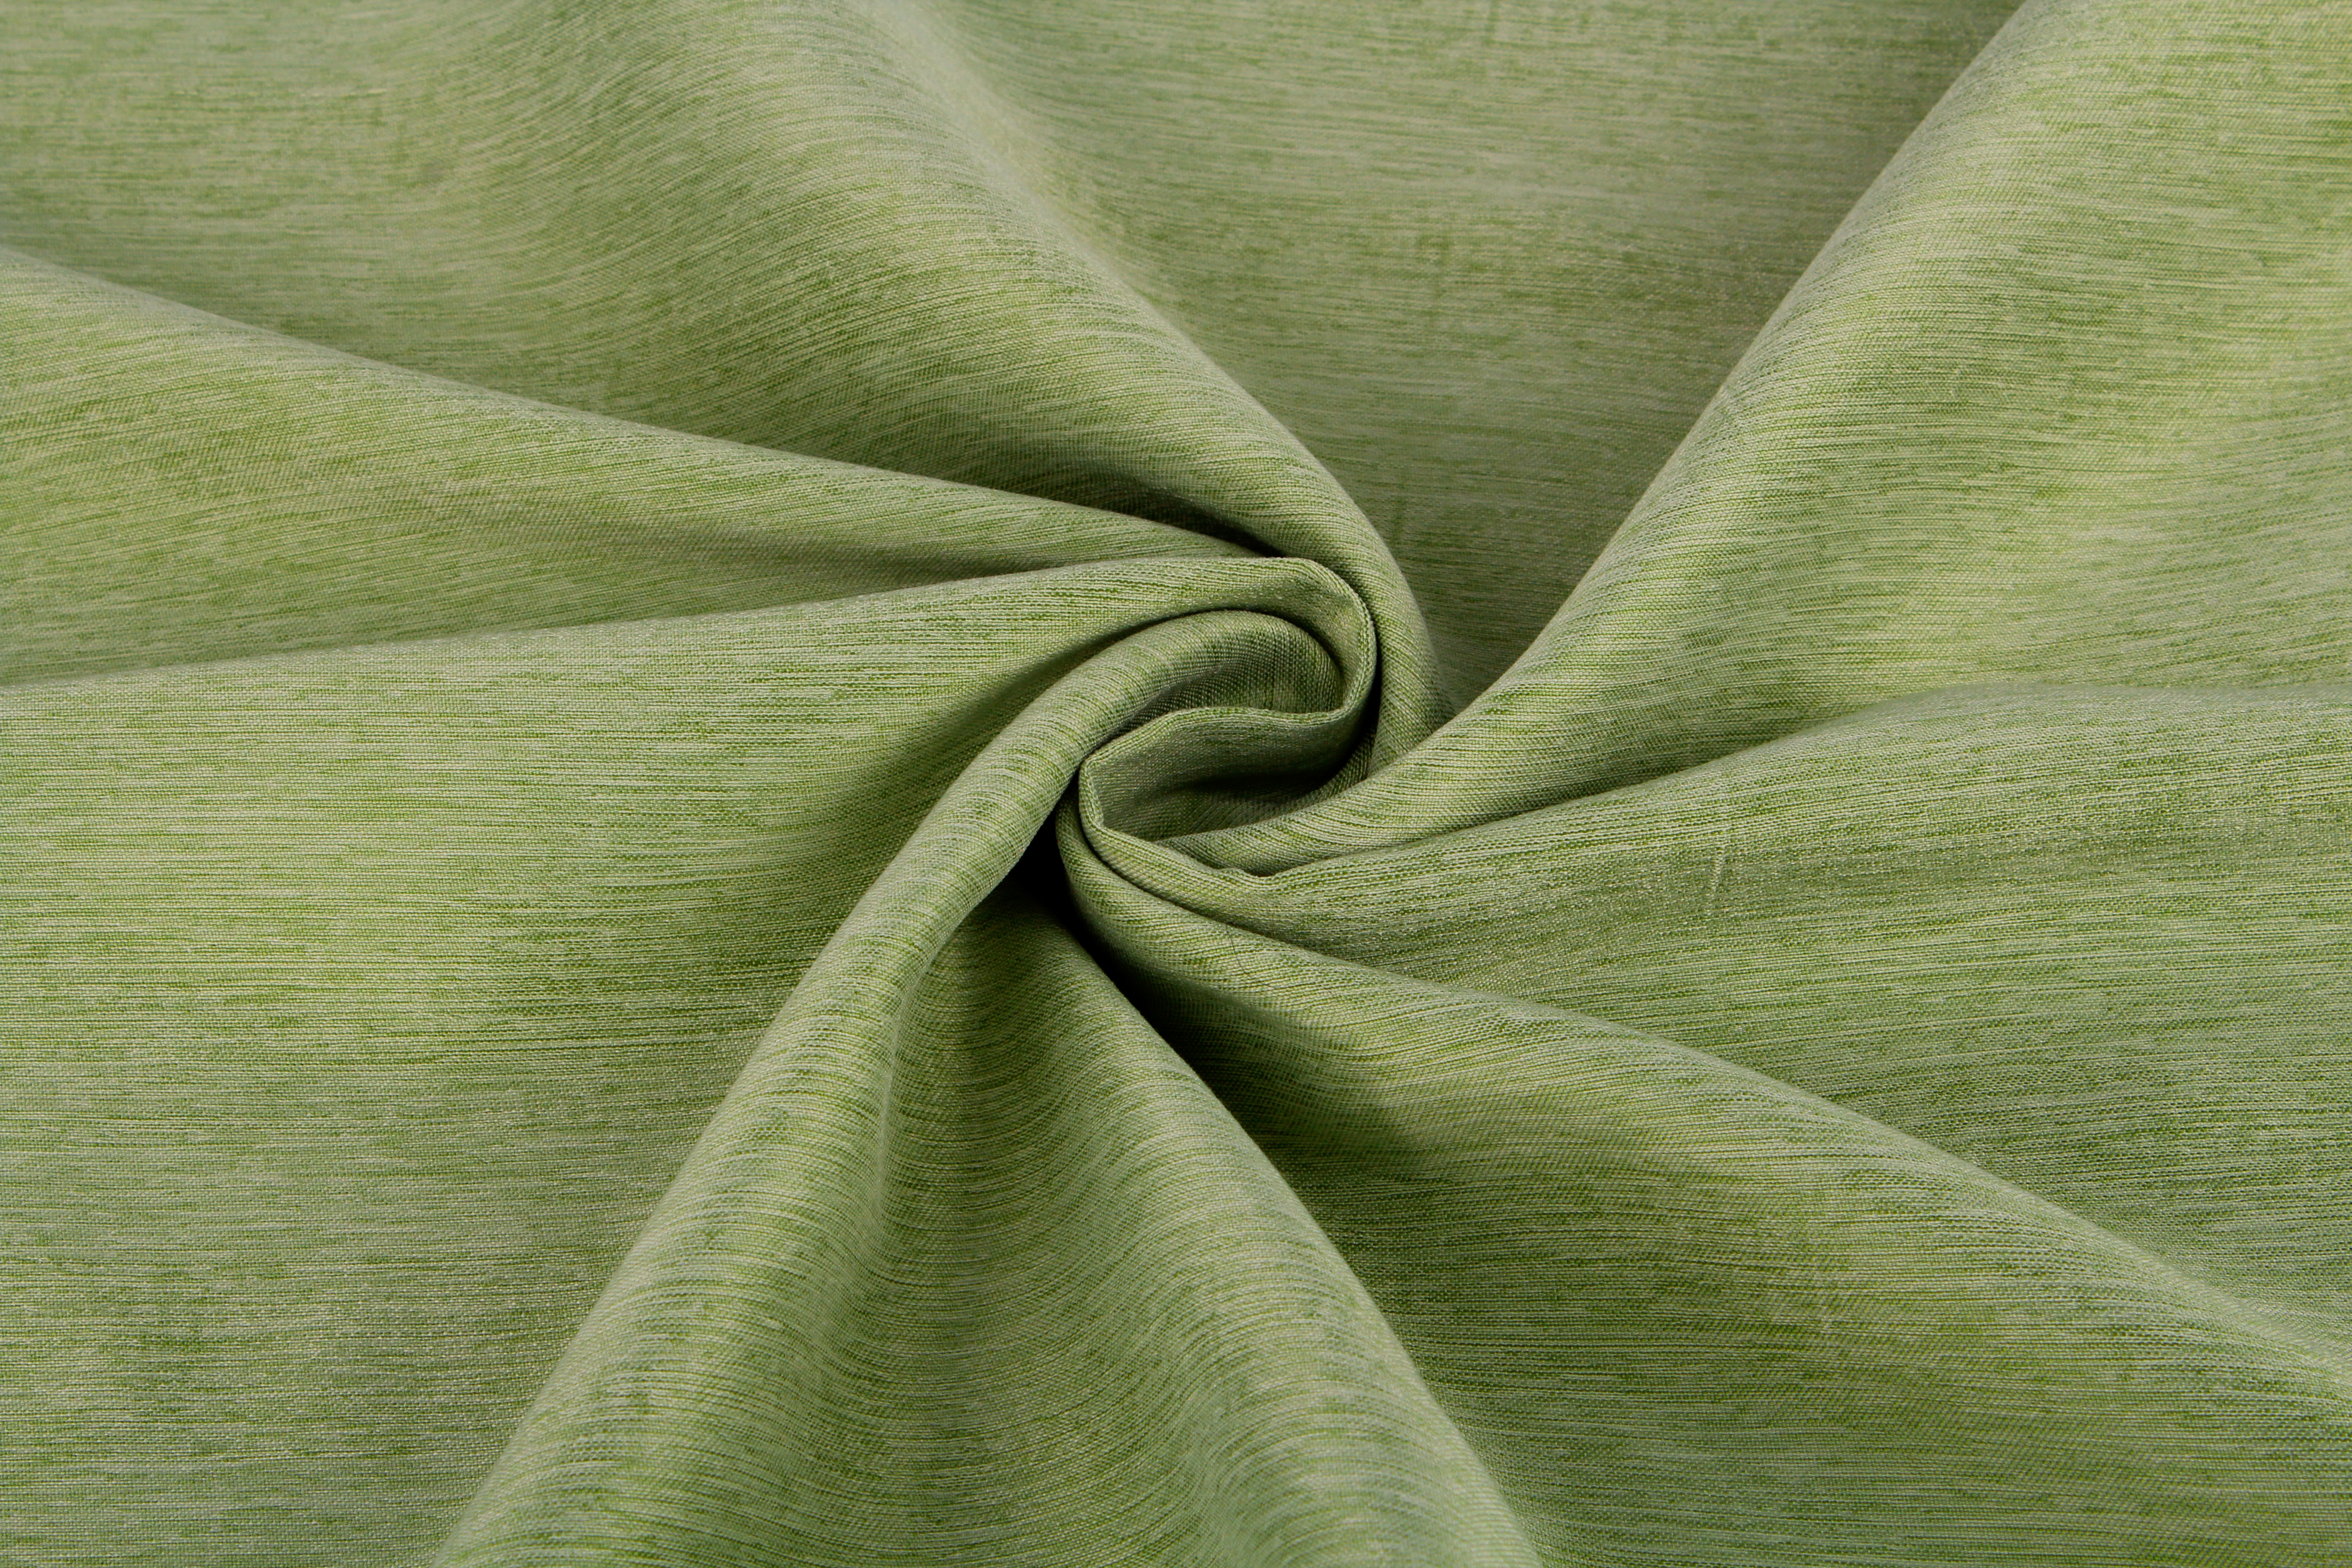 {} TexRepublic Материал Портьерная ткань Palette Цвет: Салатовый texrepublic материал портьерная ткань palette цвет брусничный